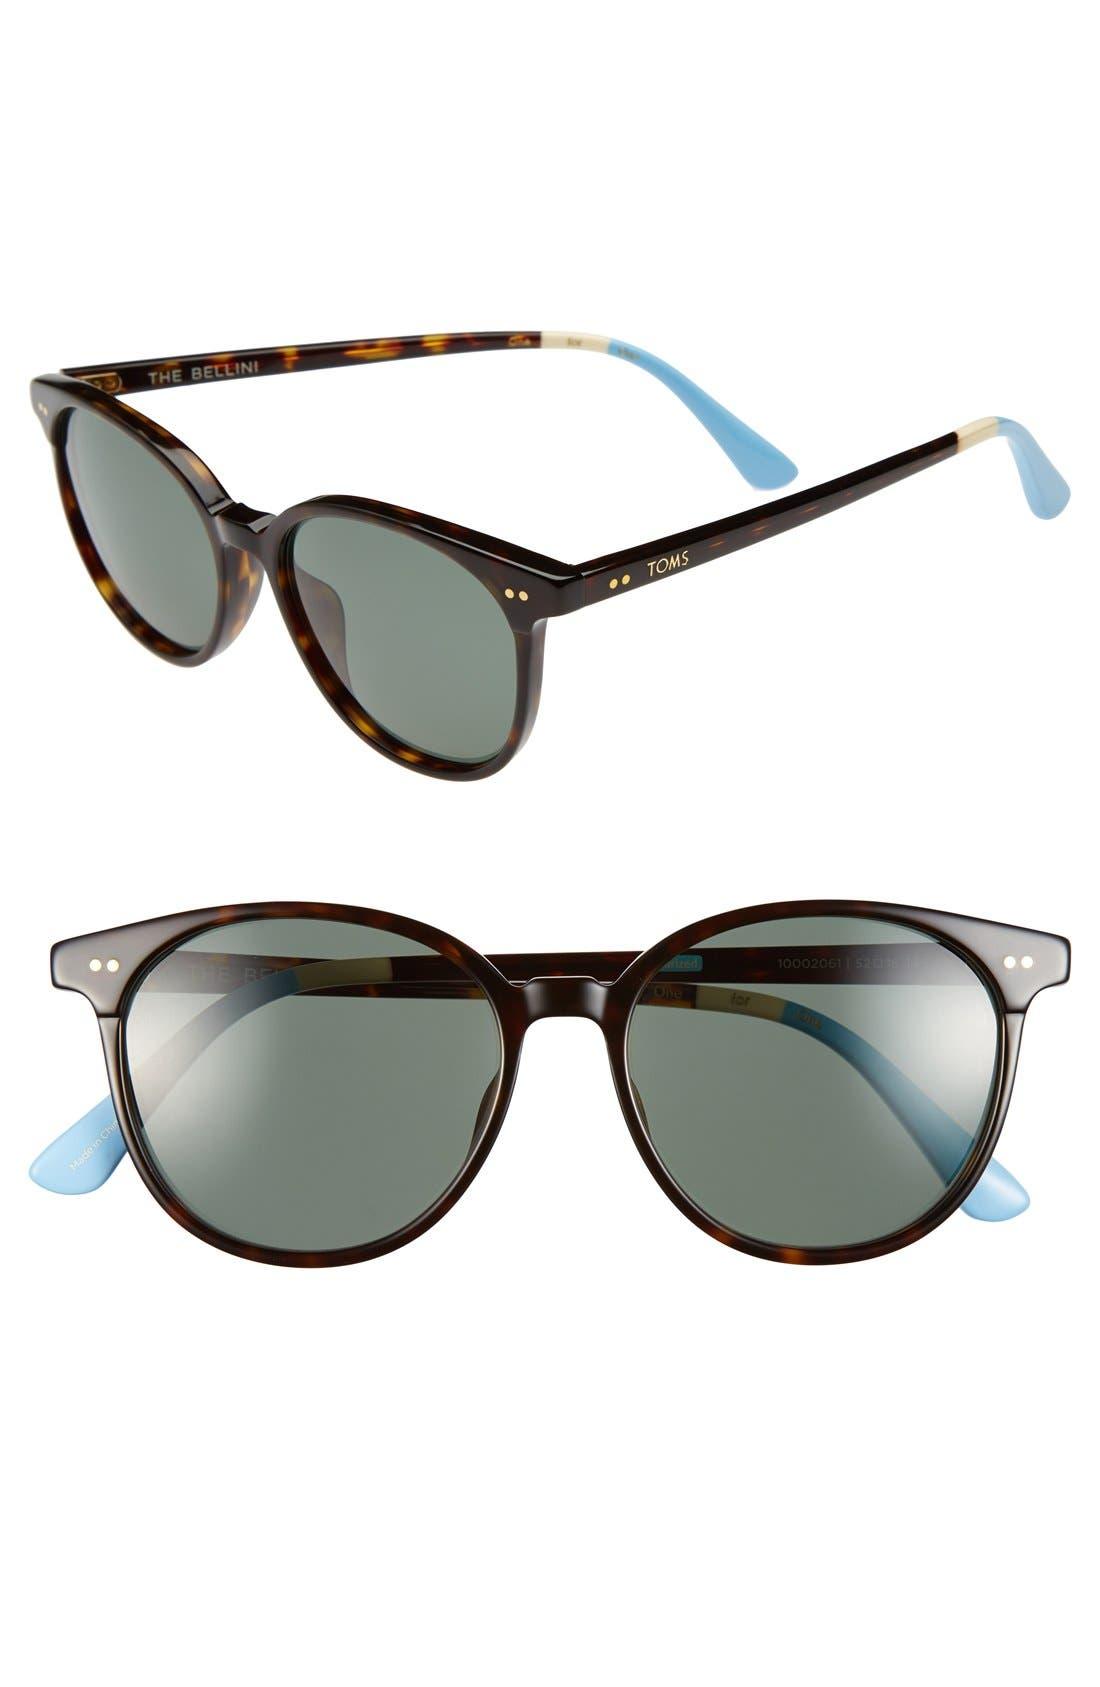 Main Image - TOMS 'Bellini' 52mm Polarized Sunglasses